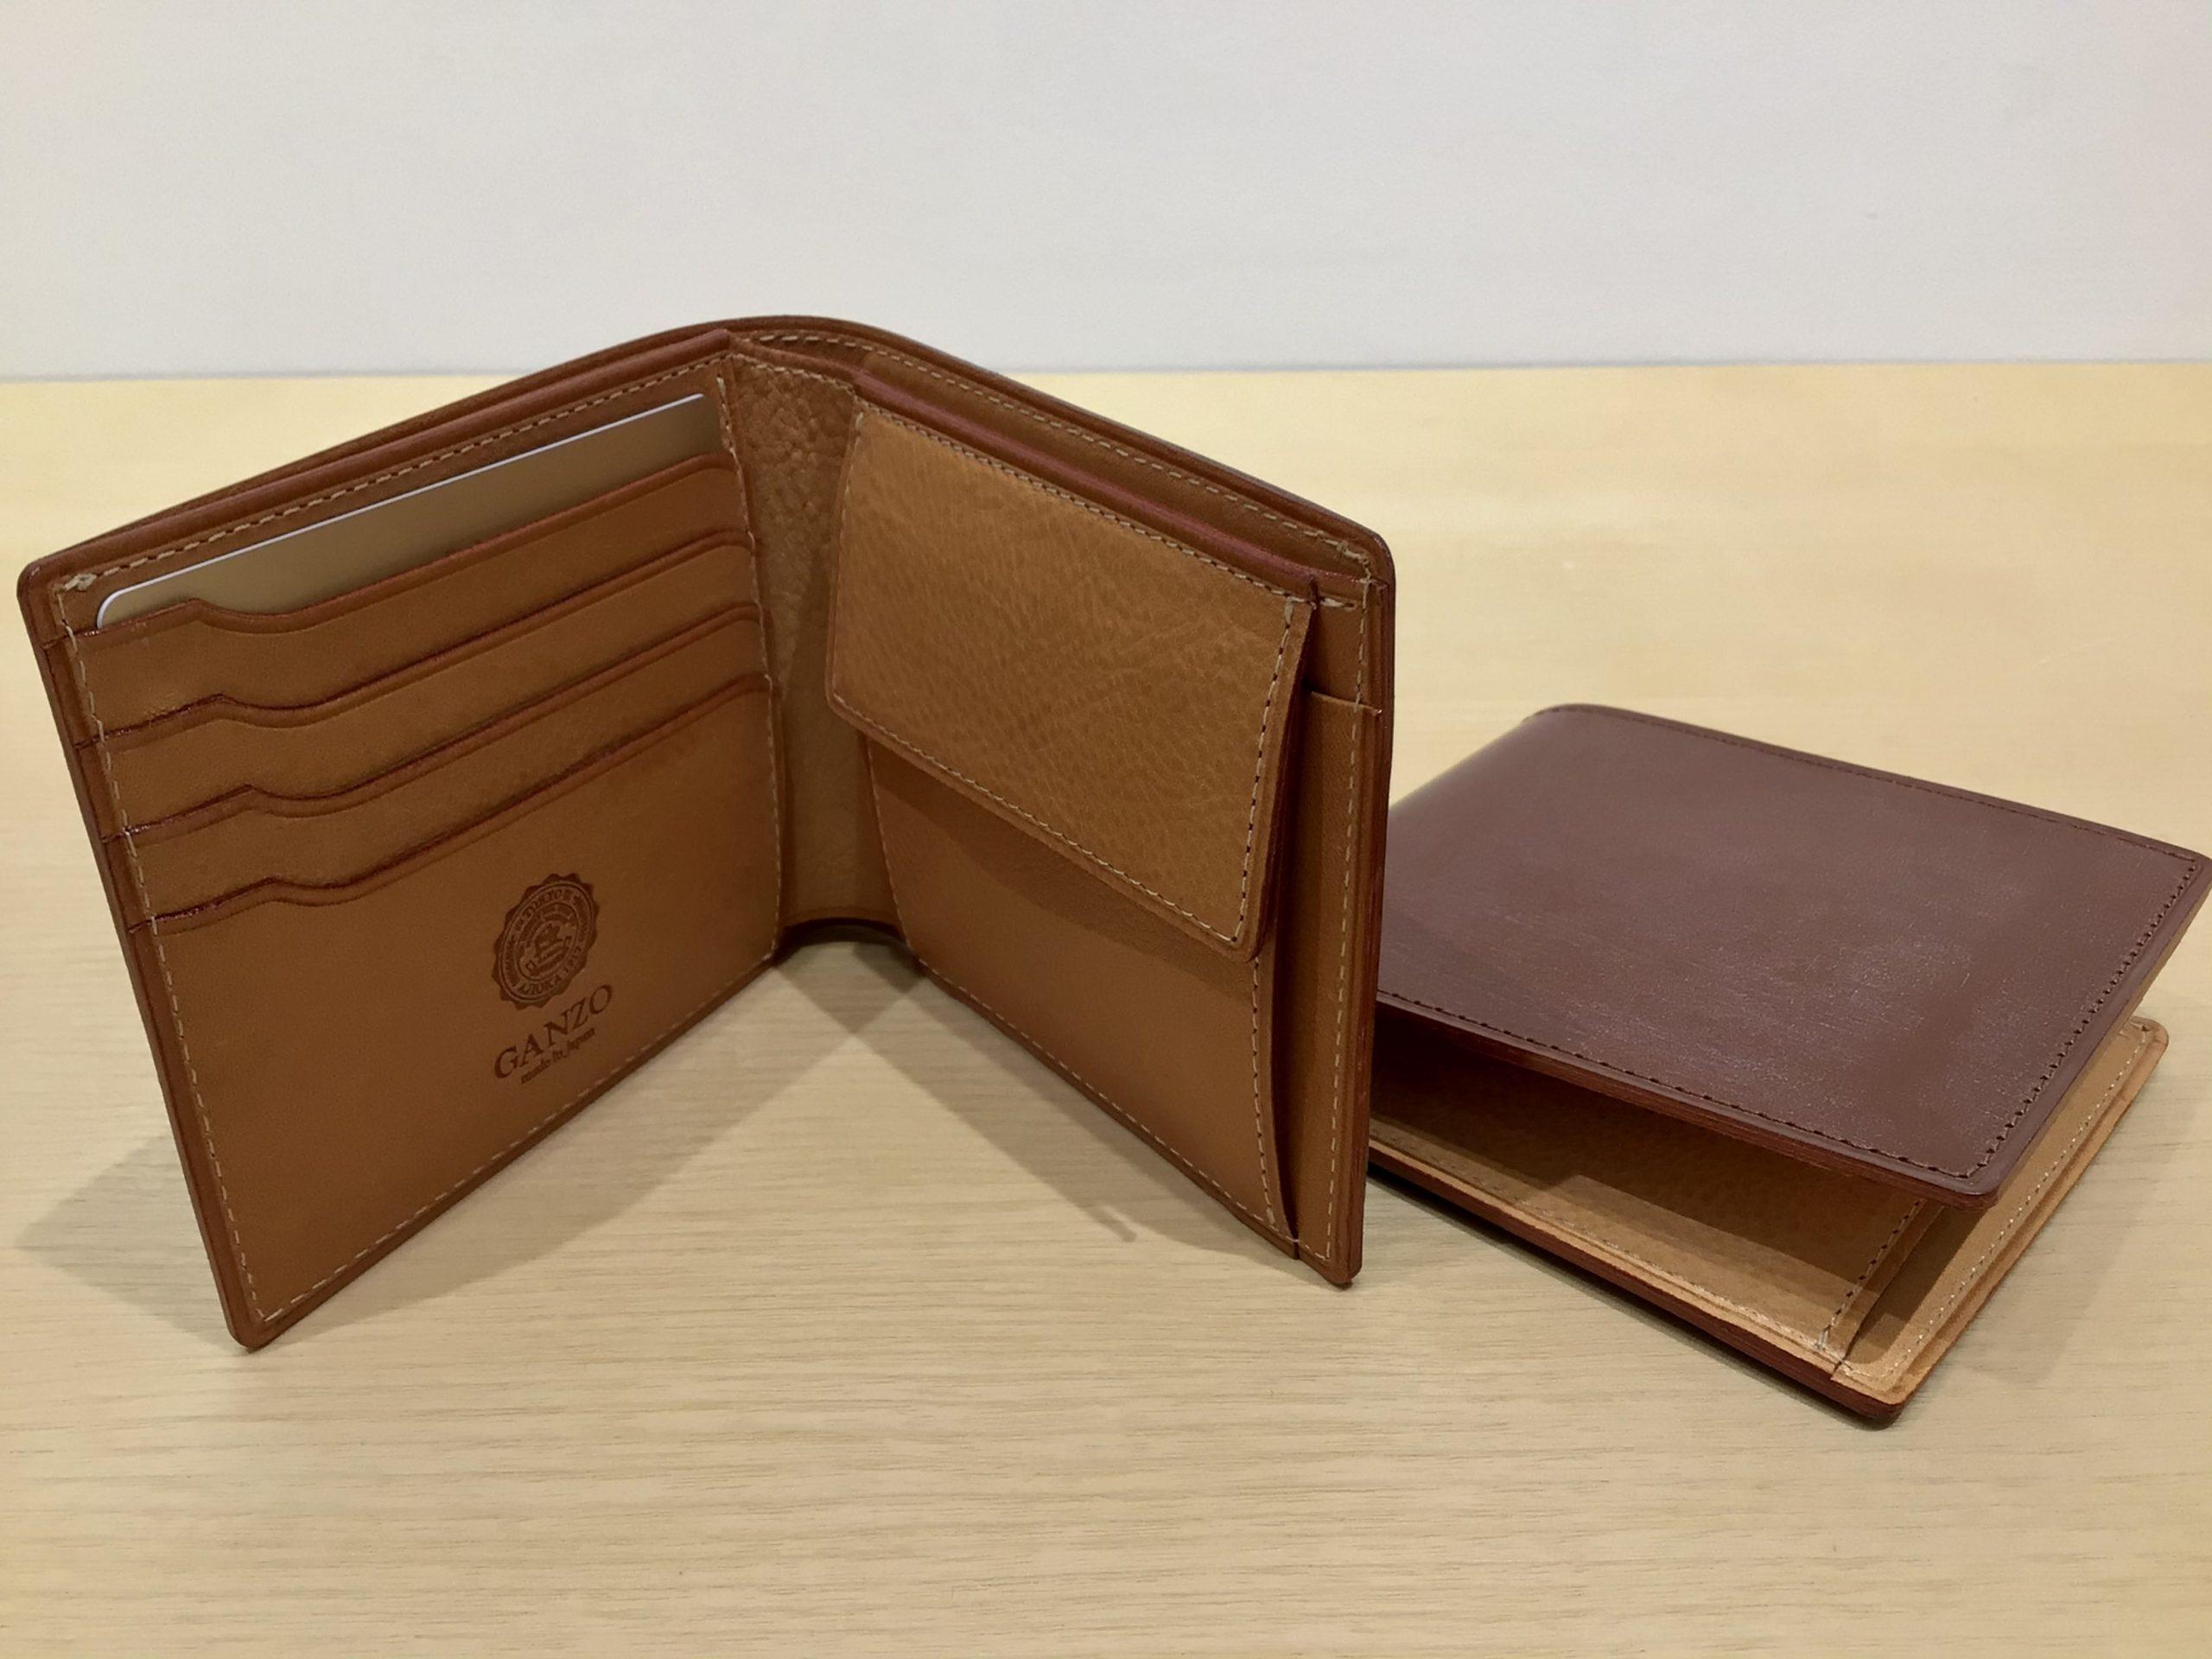 GANZOの薄型小銭入れ二つ折り財布